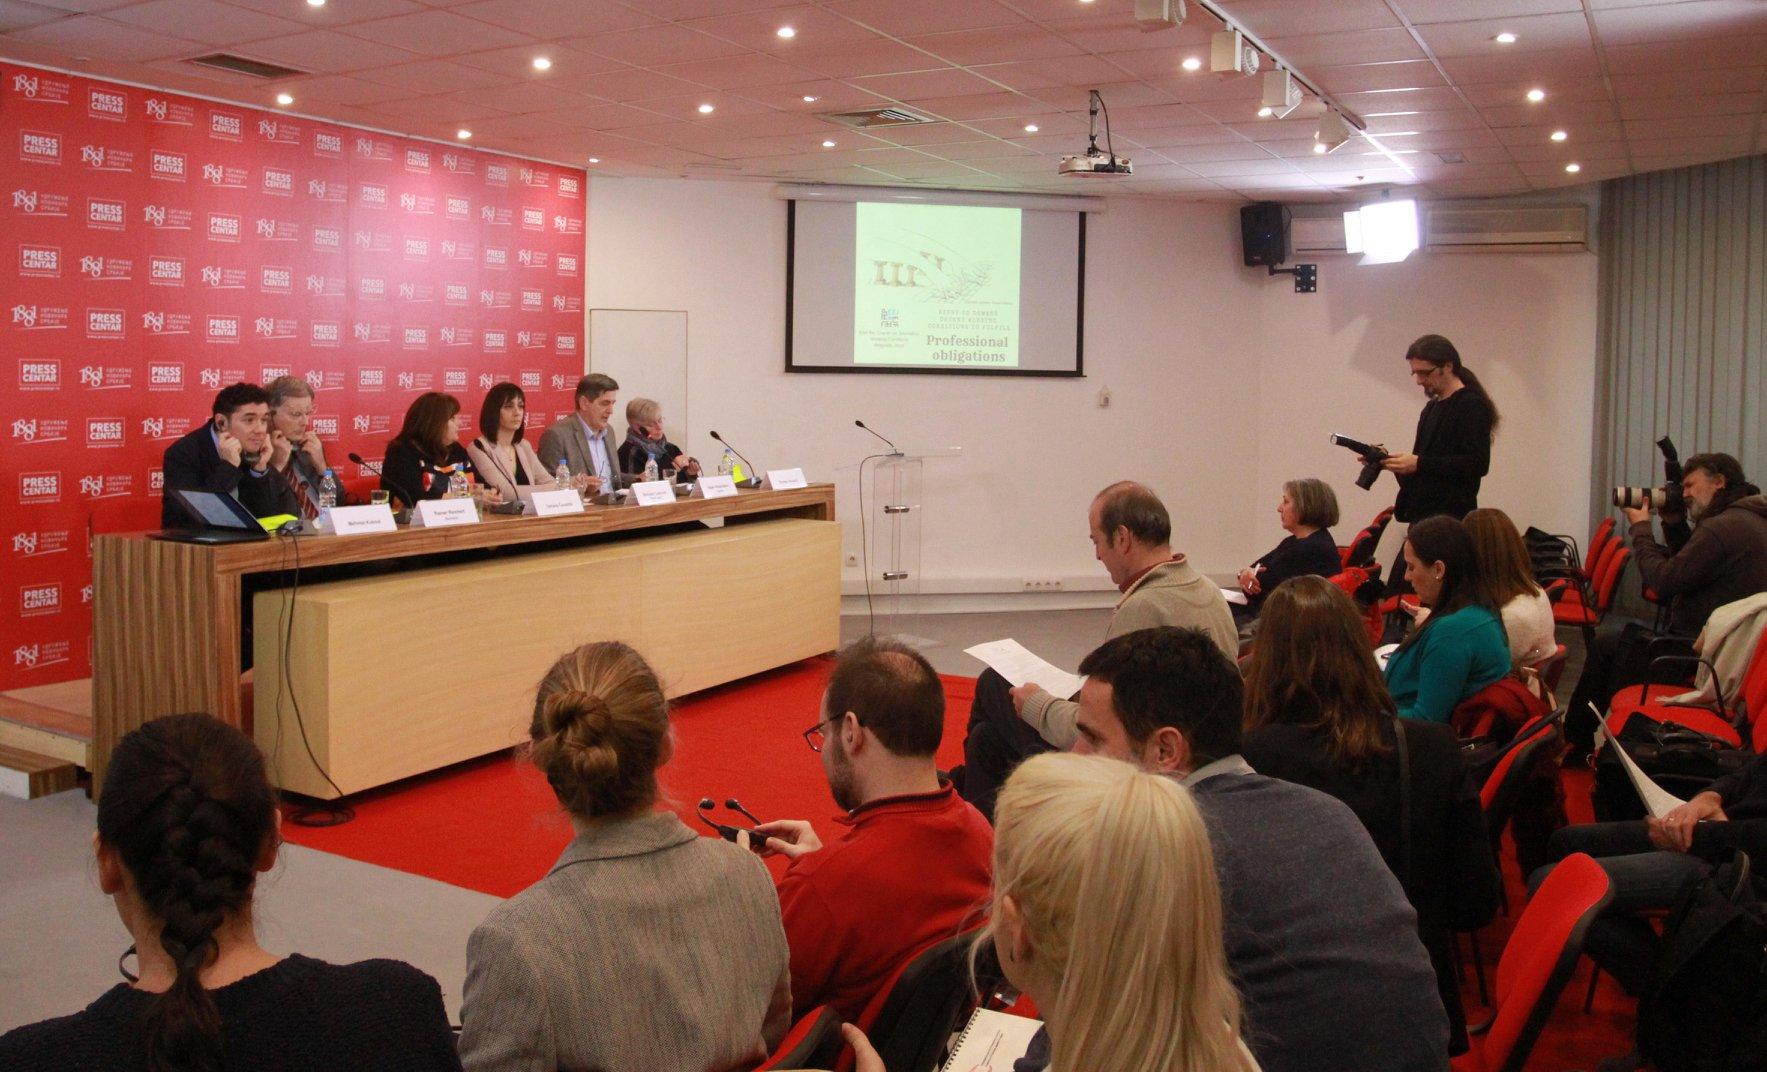 Foto: Miloš Miškov / Press centar UNS-a / Facebook